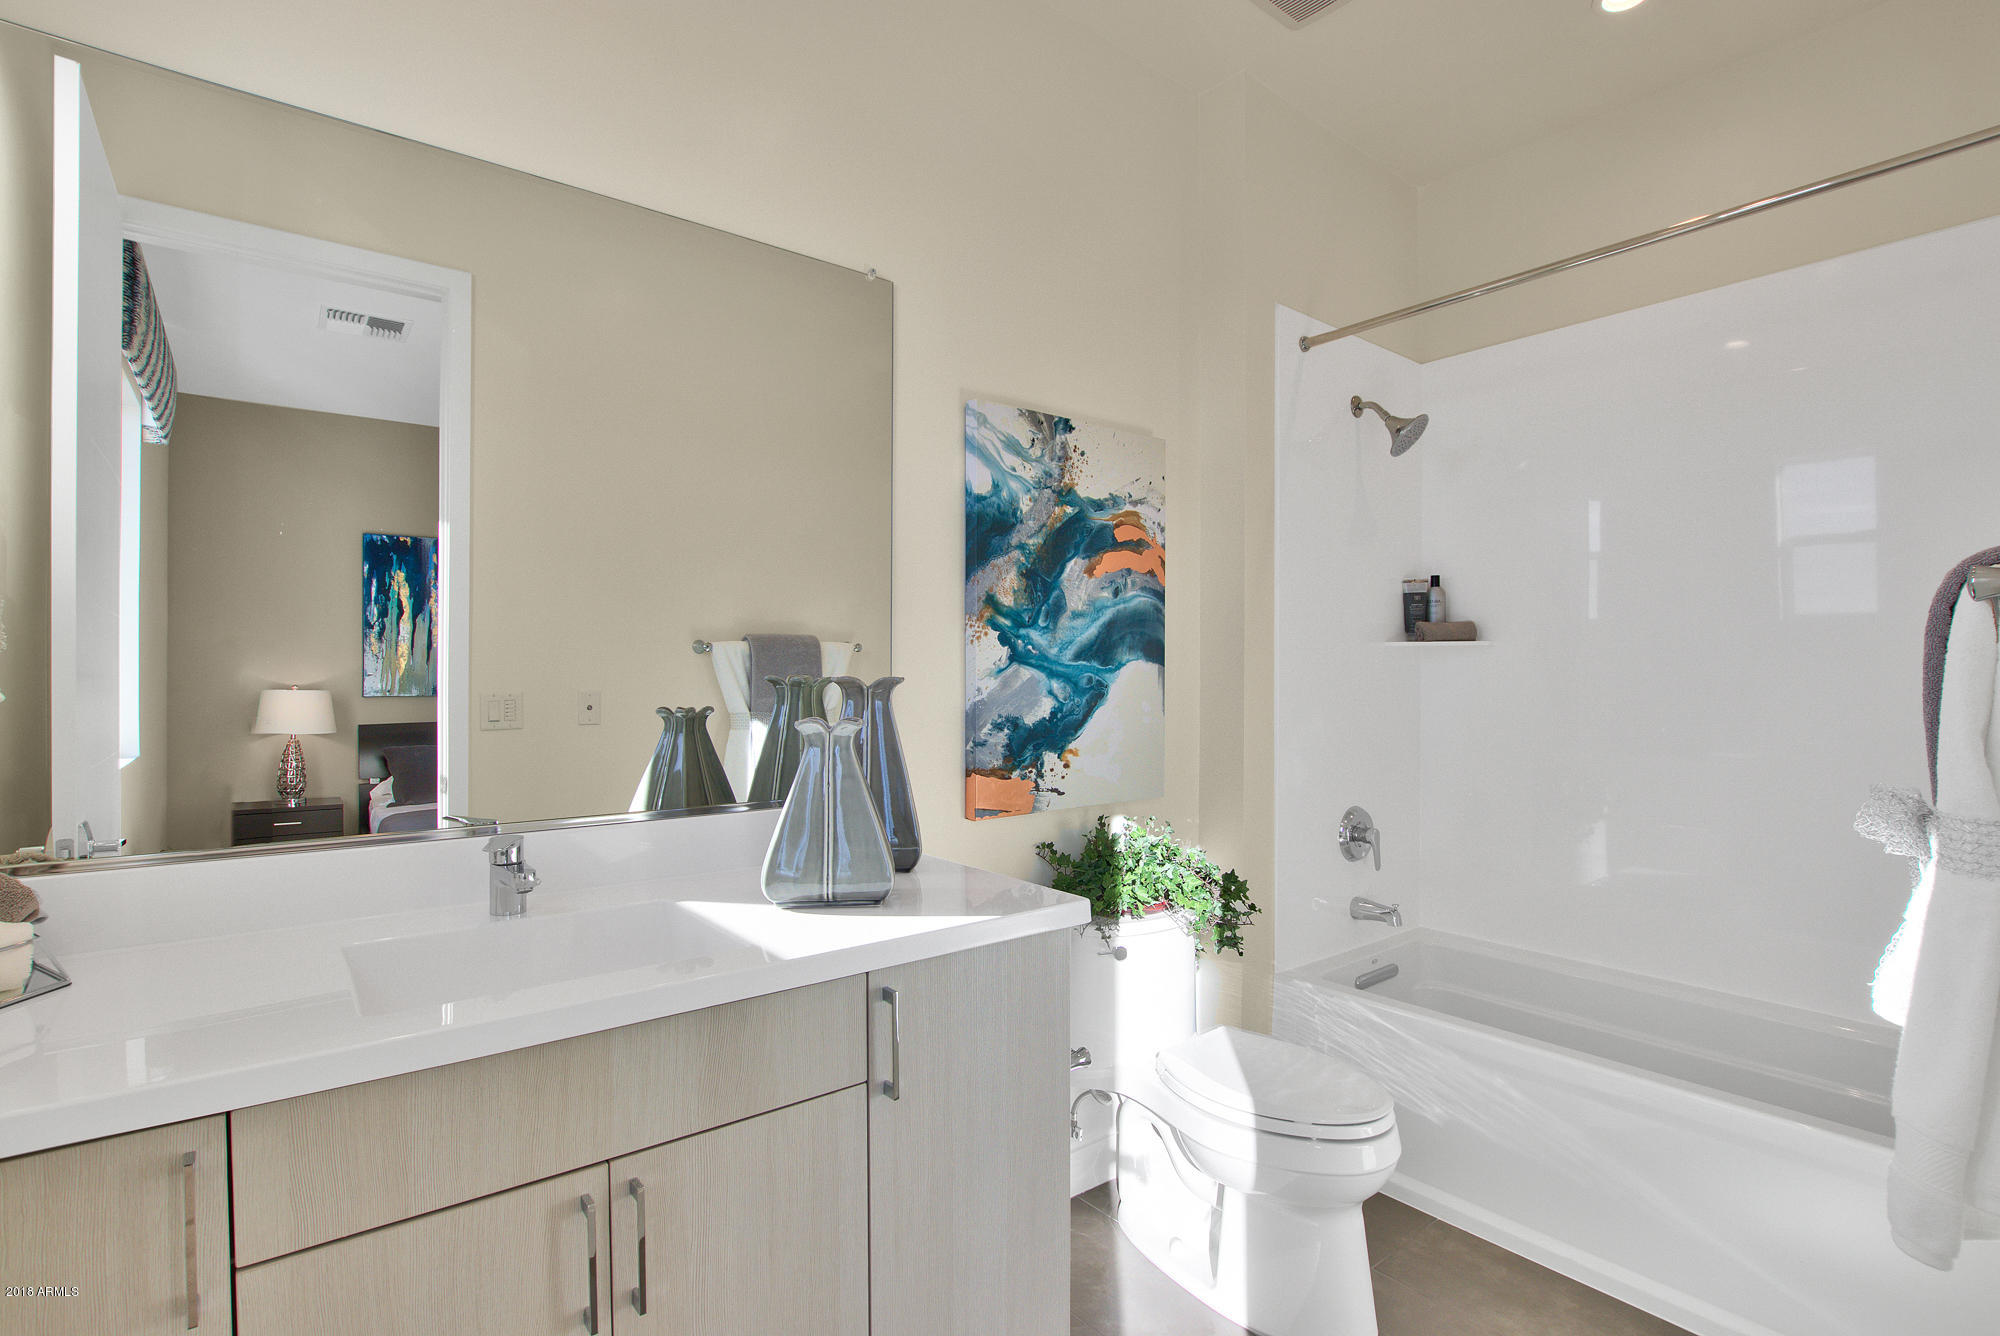 16510 N 92ND Street Unit 1006 Scottsdale, AZ 85260 - MLS #: 5844316